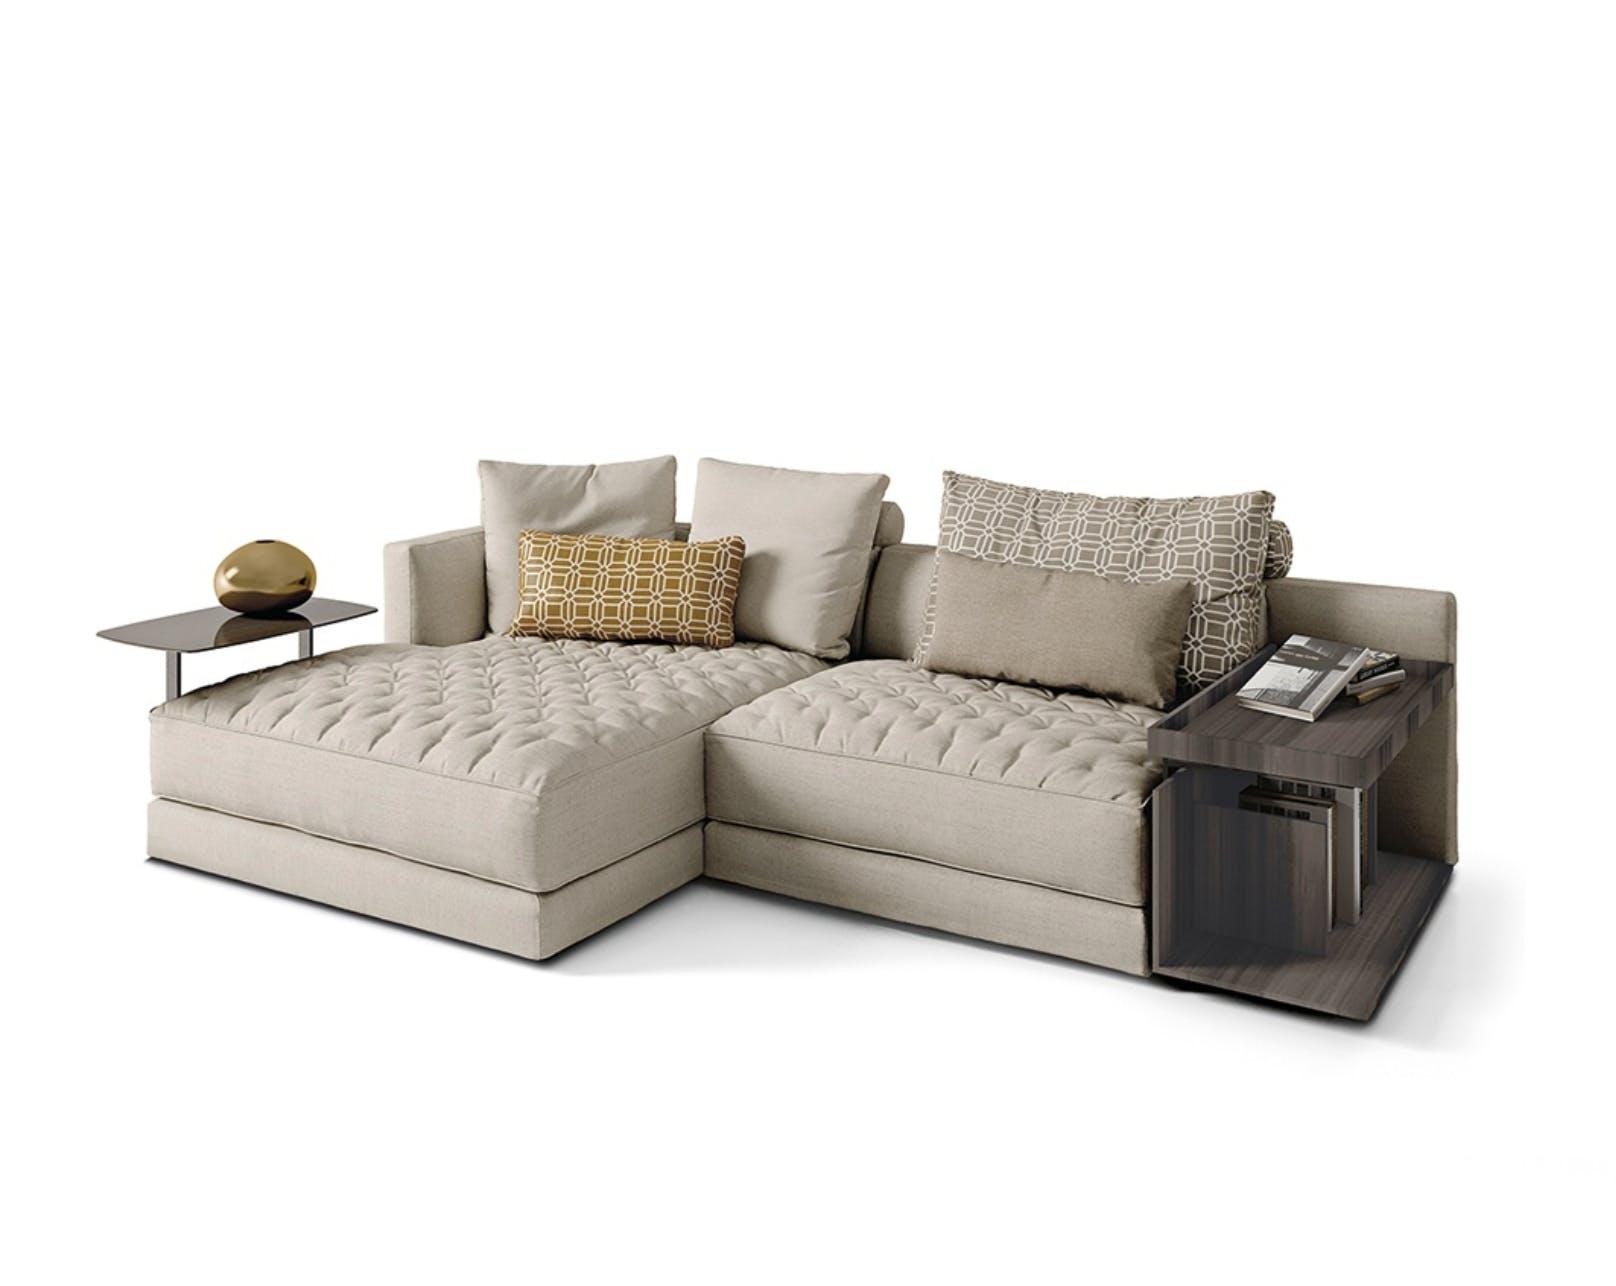 Frigerio Miller Sofa Front3 Haute Living